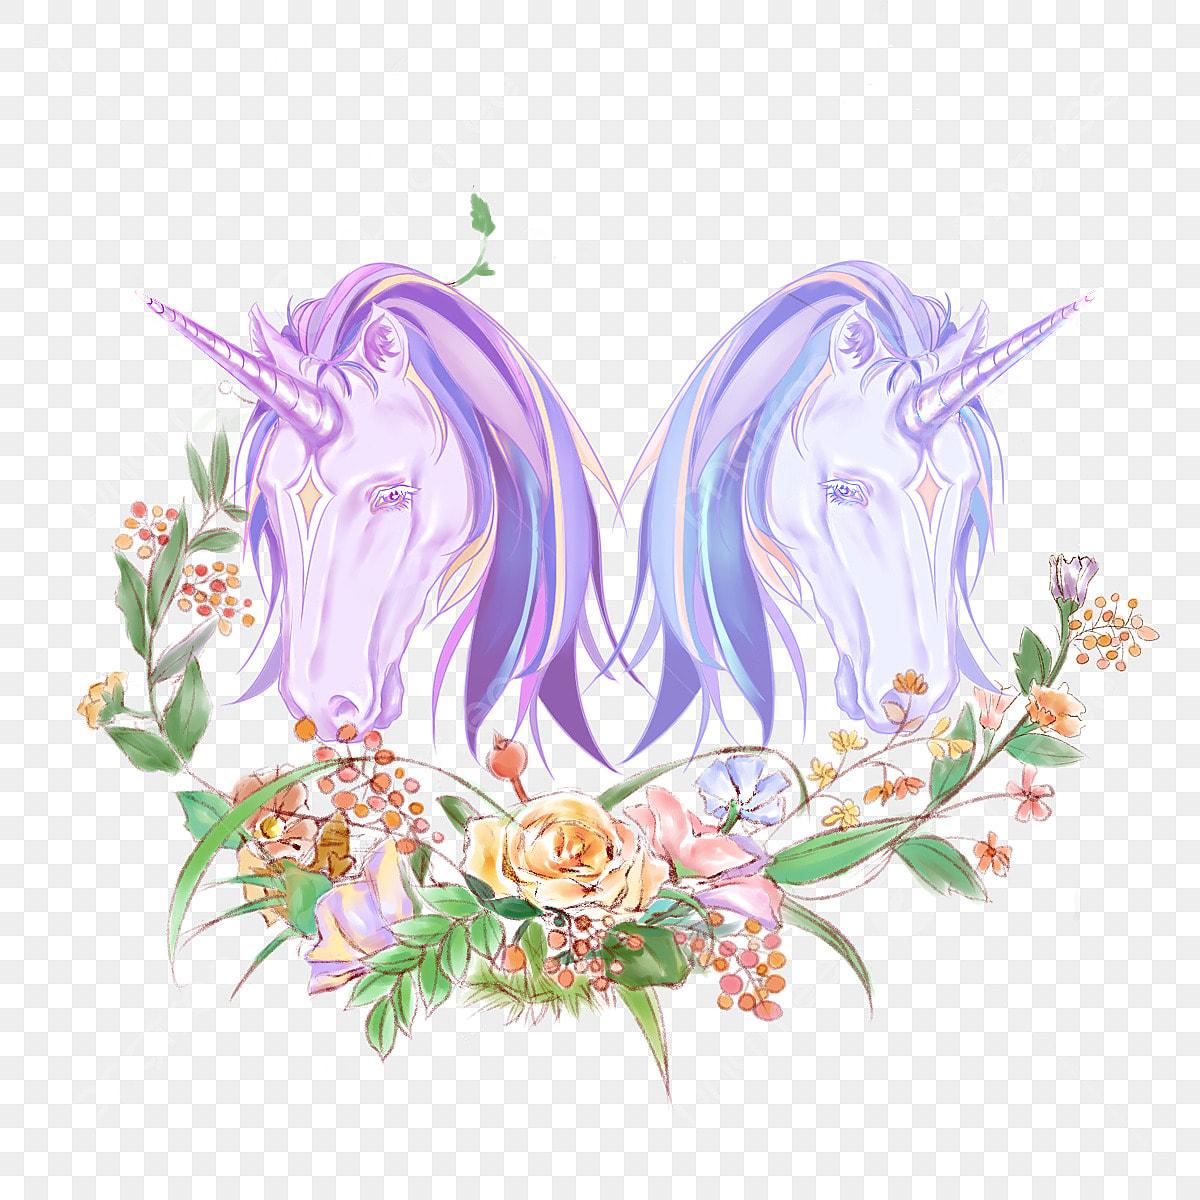 licorne floral element l u00e9gende  u00e9toile dream fichier png et